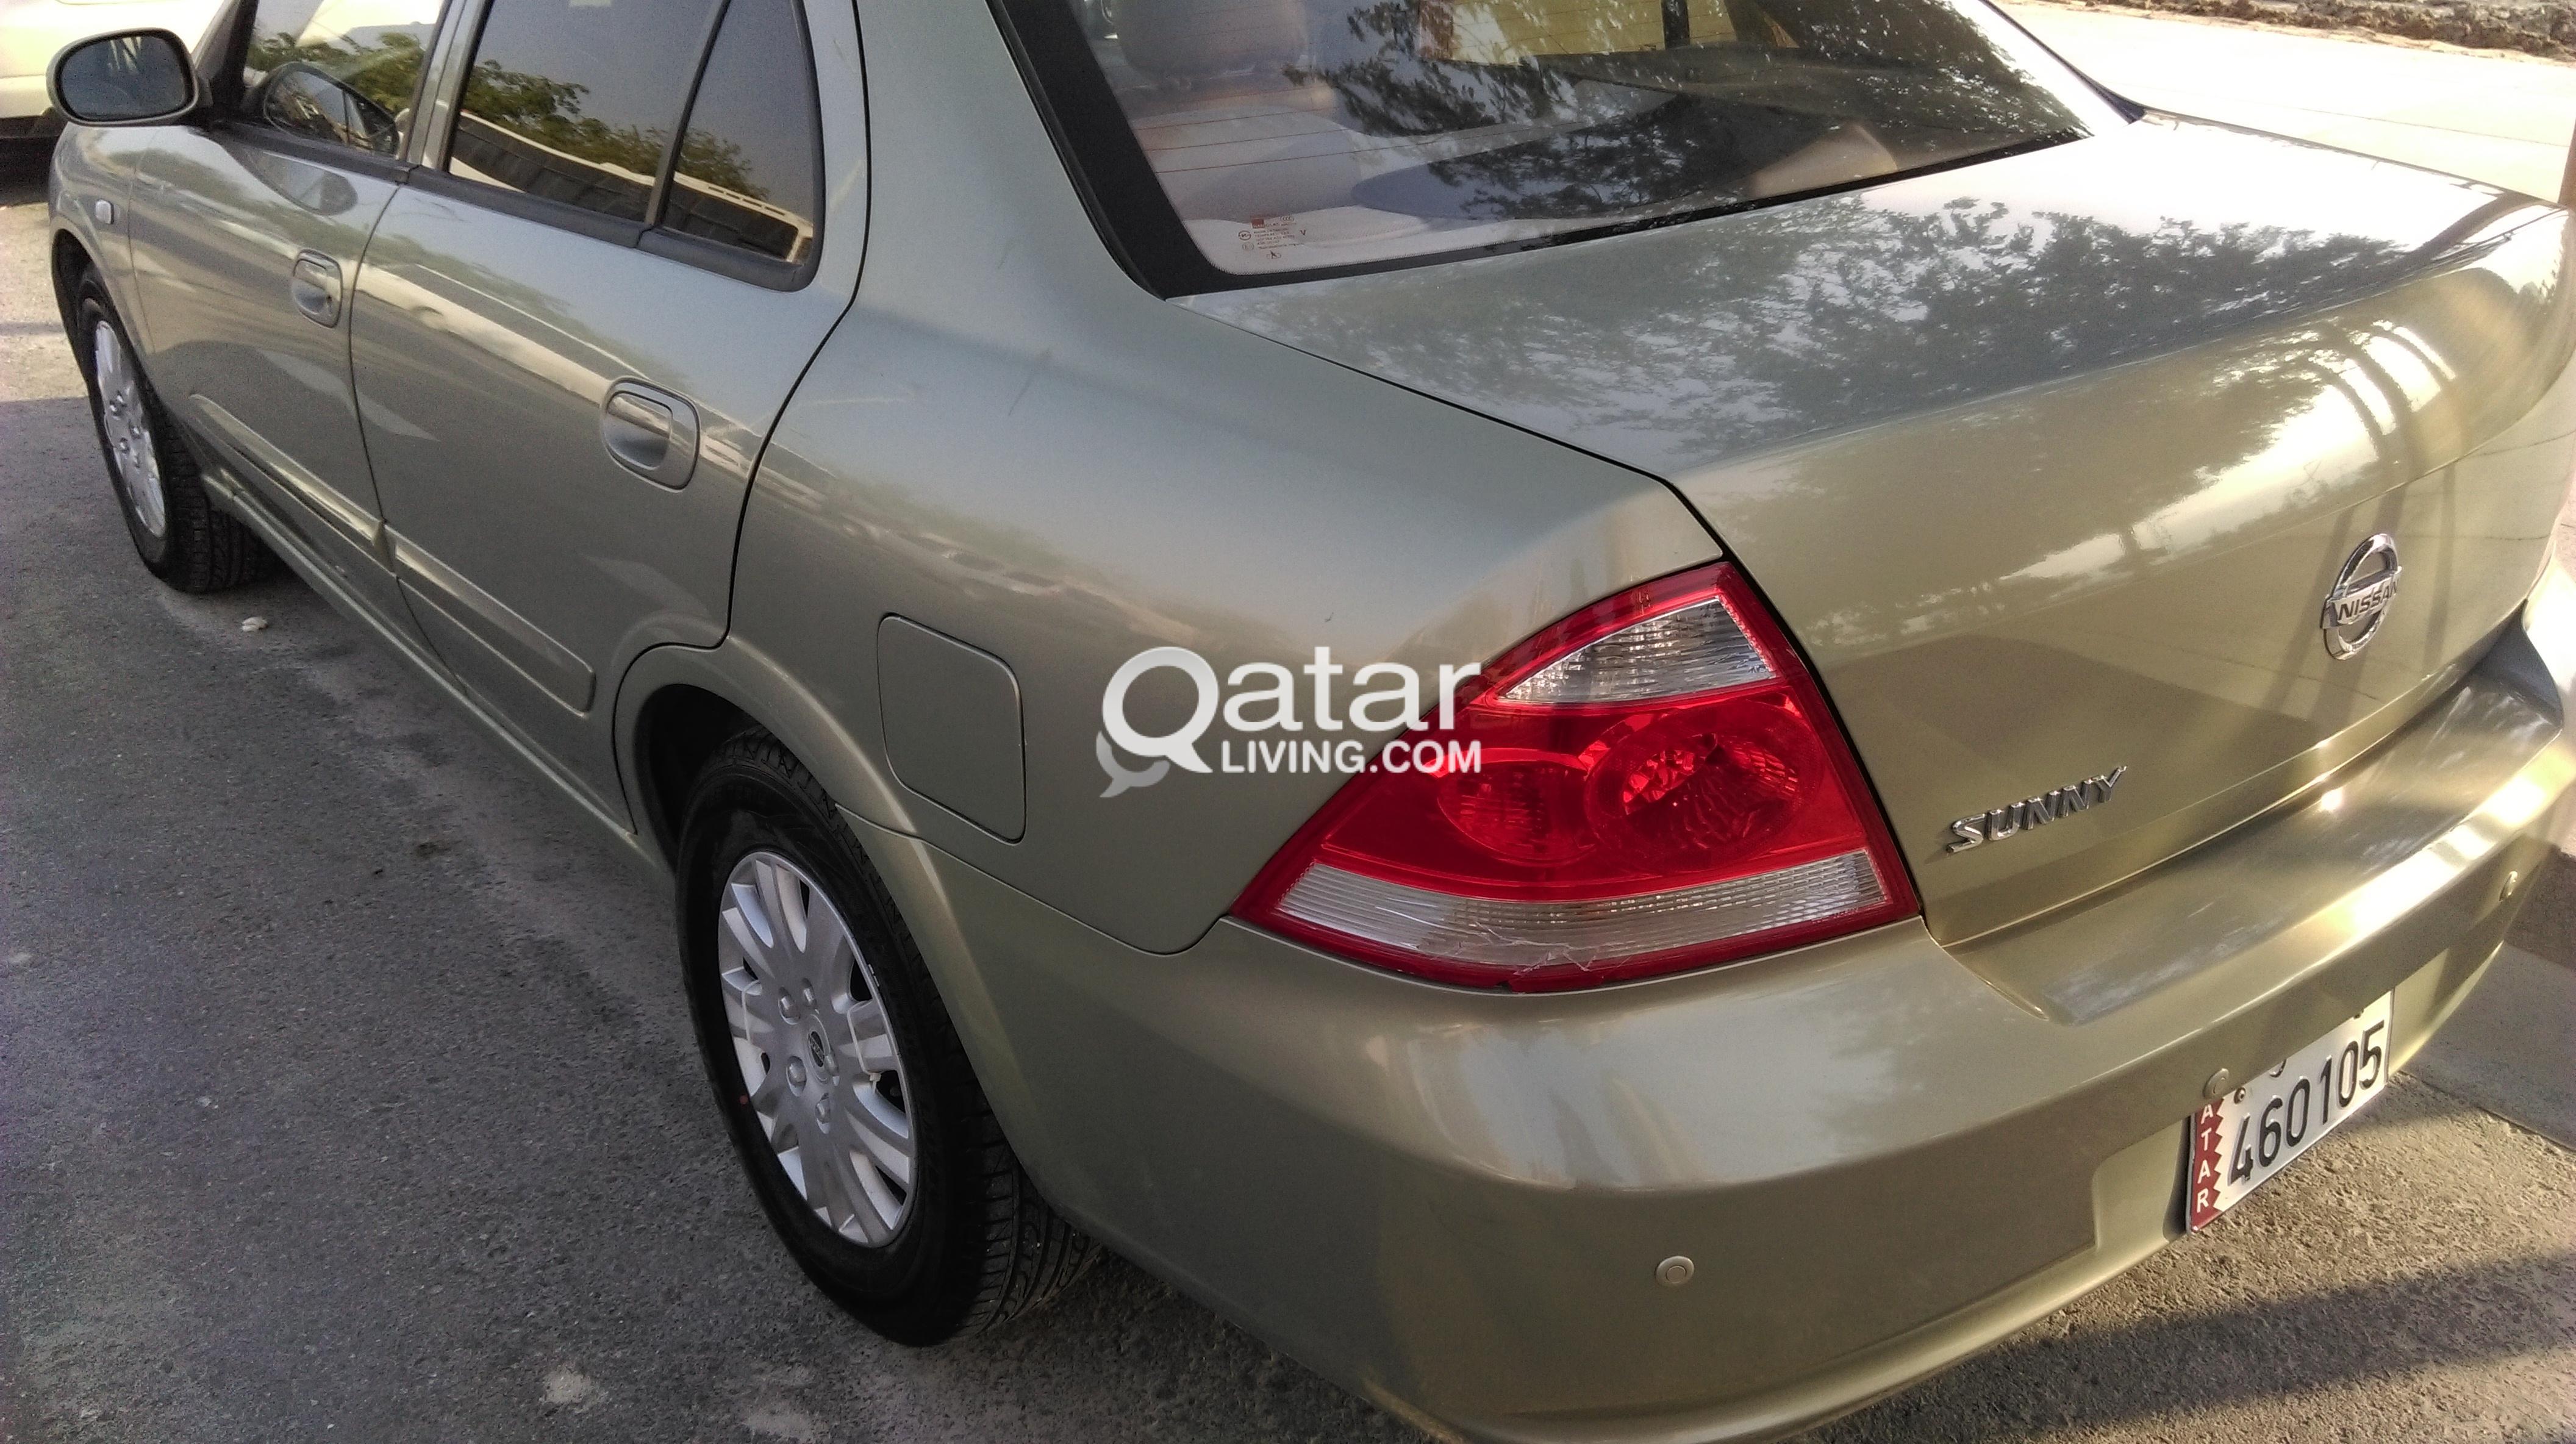 Nissan Sunny Korean Model 2011 Urgent Sale Qatar Living